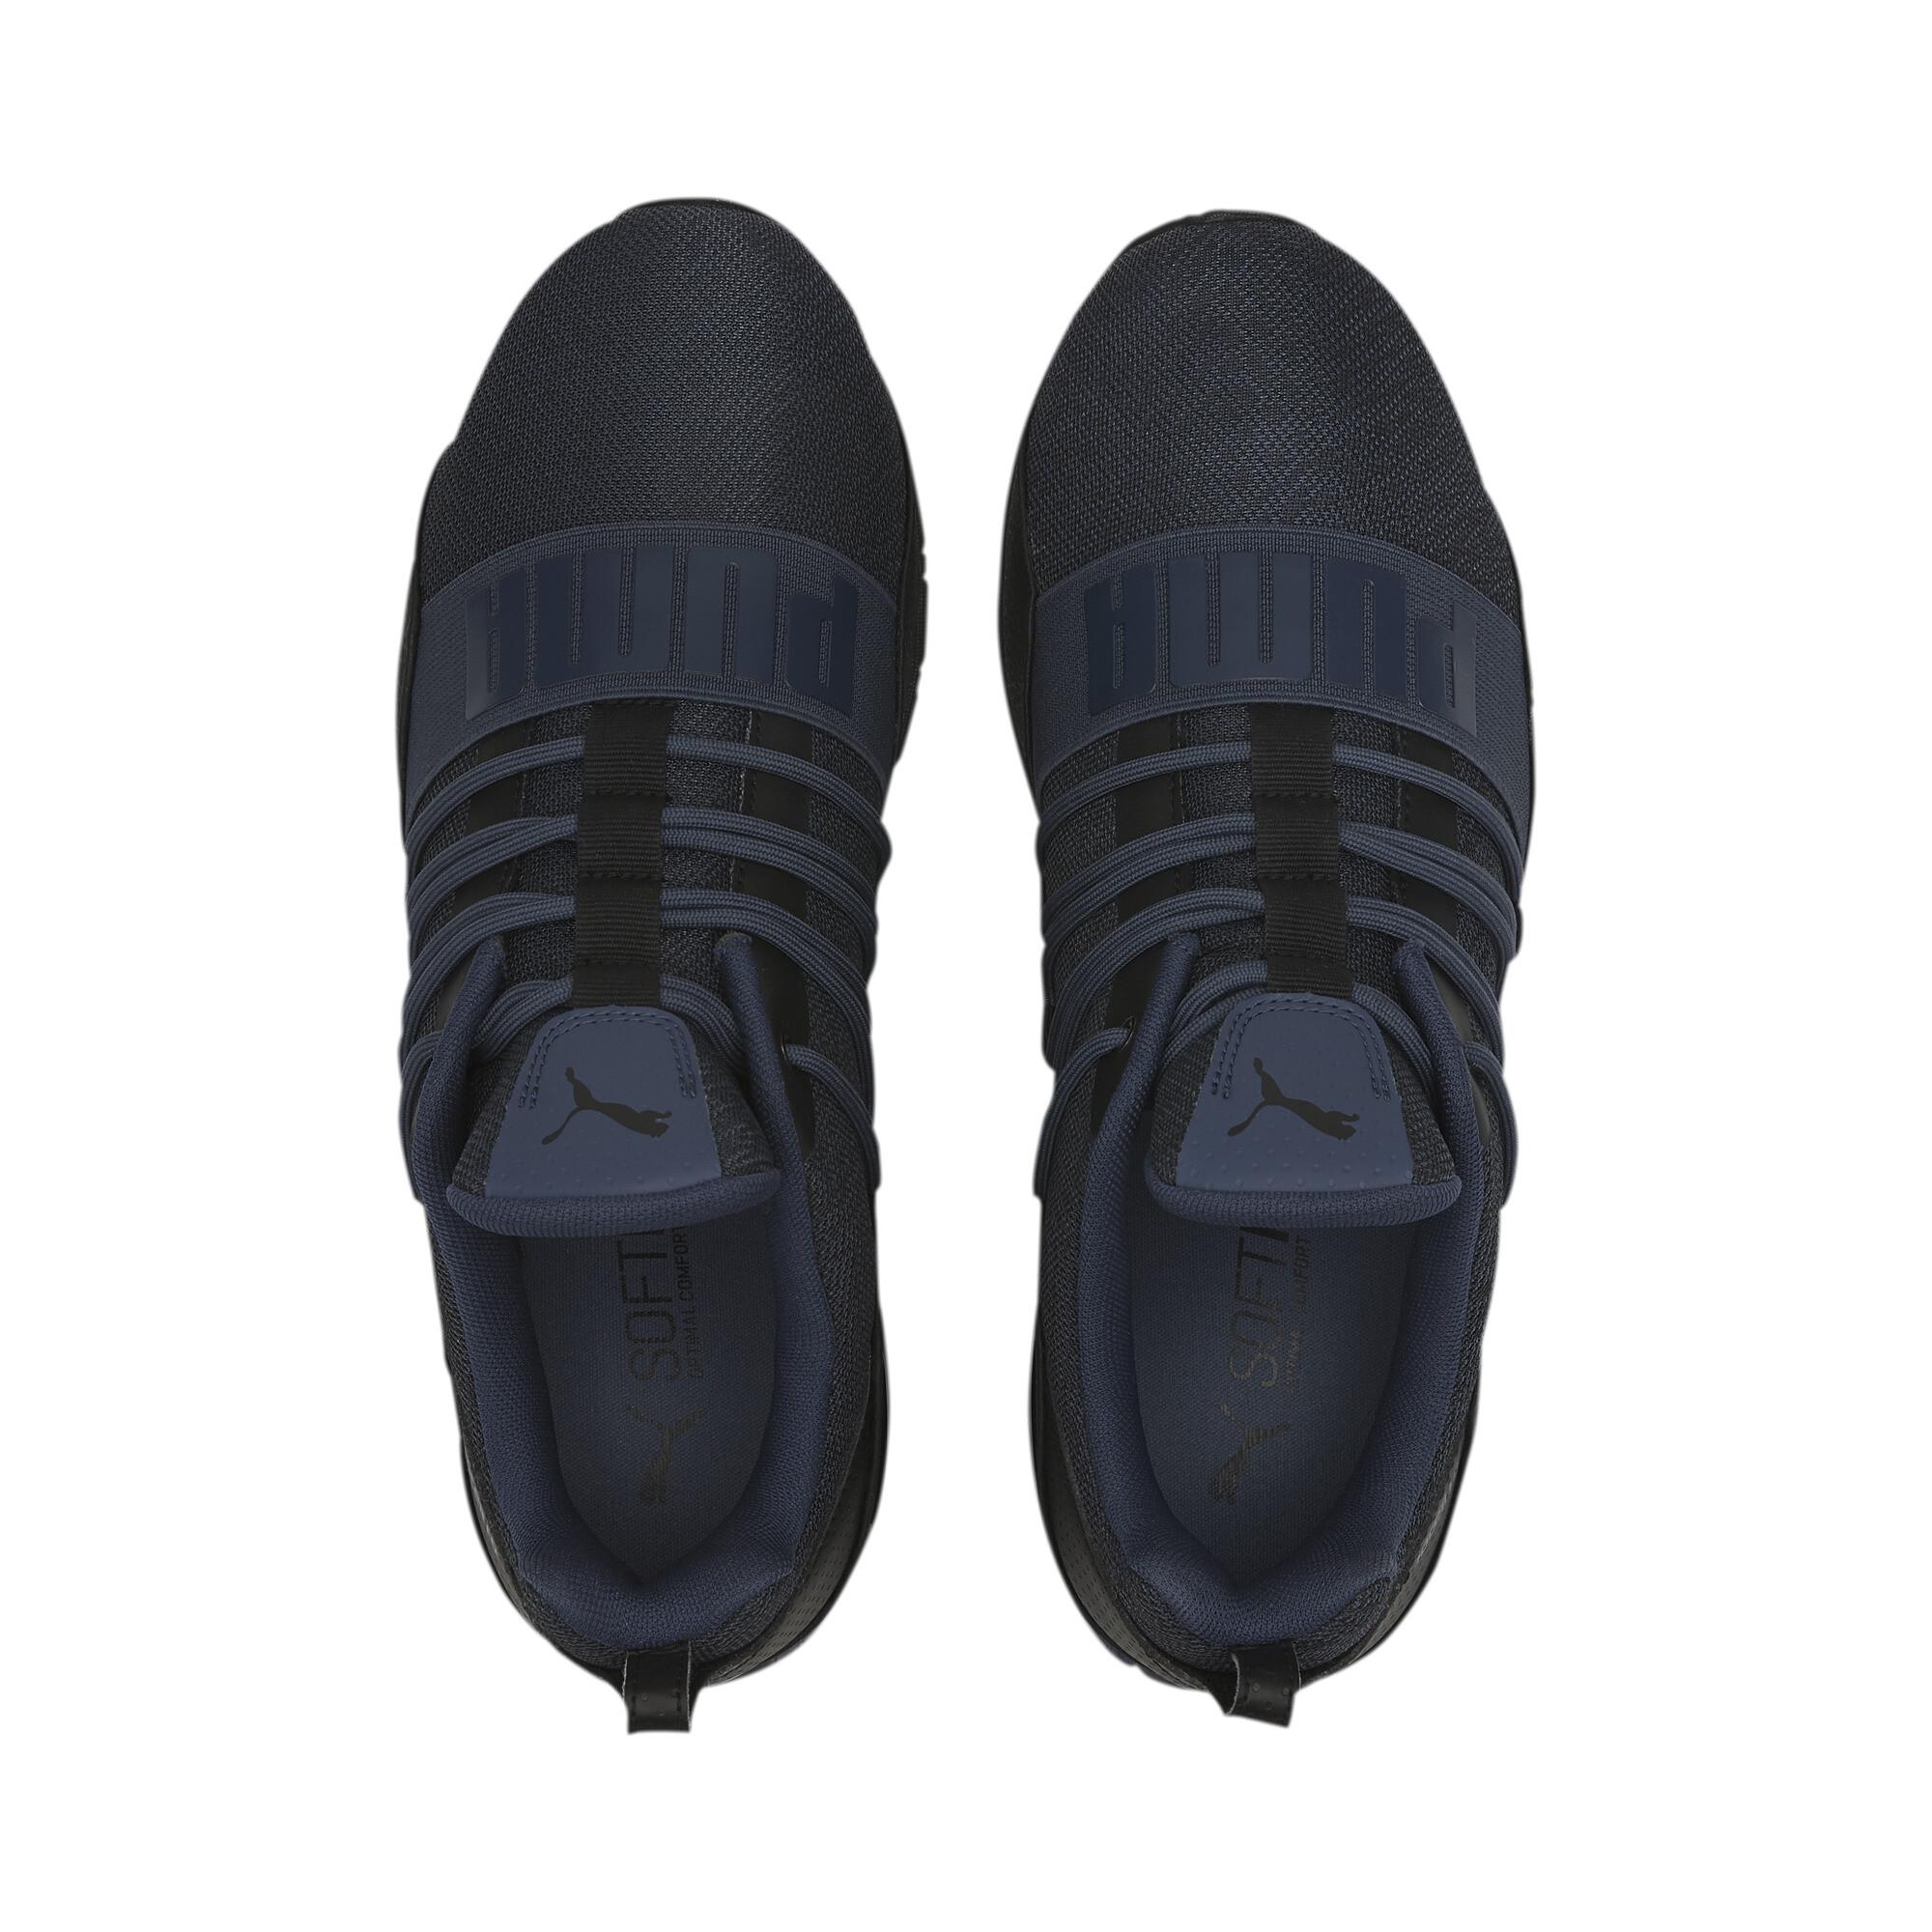 PUMA-Men-039-s-CELL-Regulate-Bold-Training-Shoes thumbnail 8